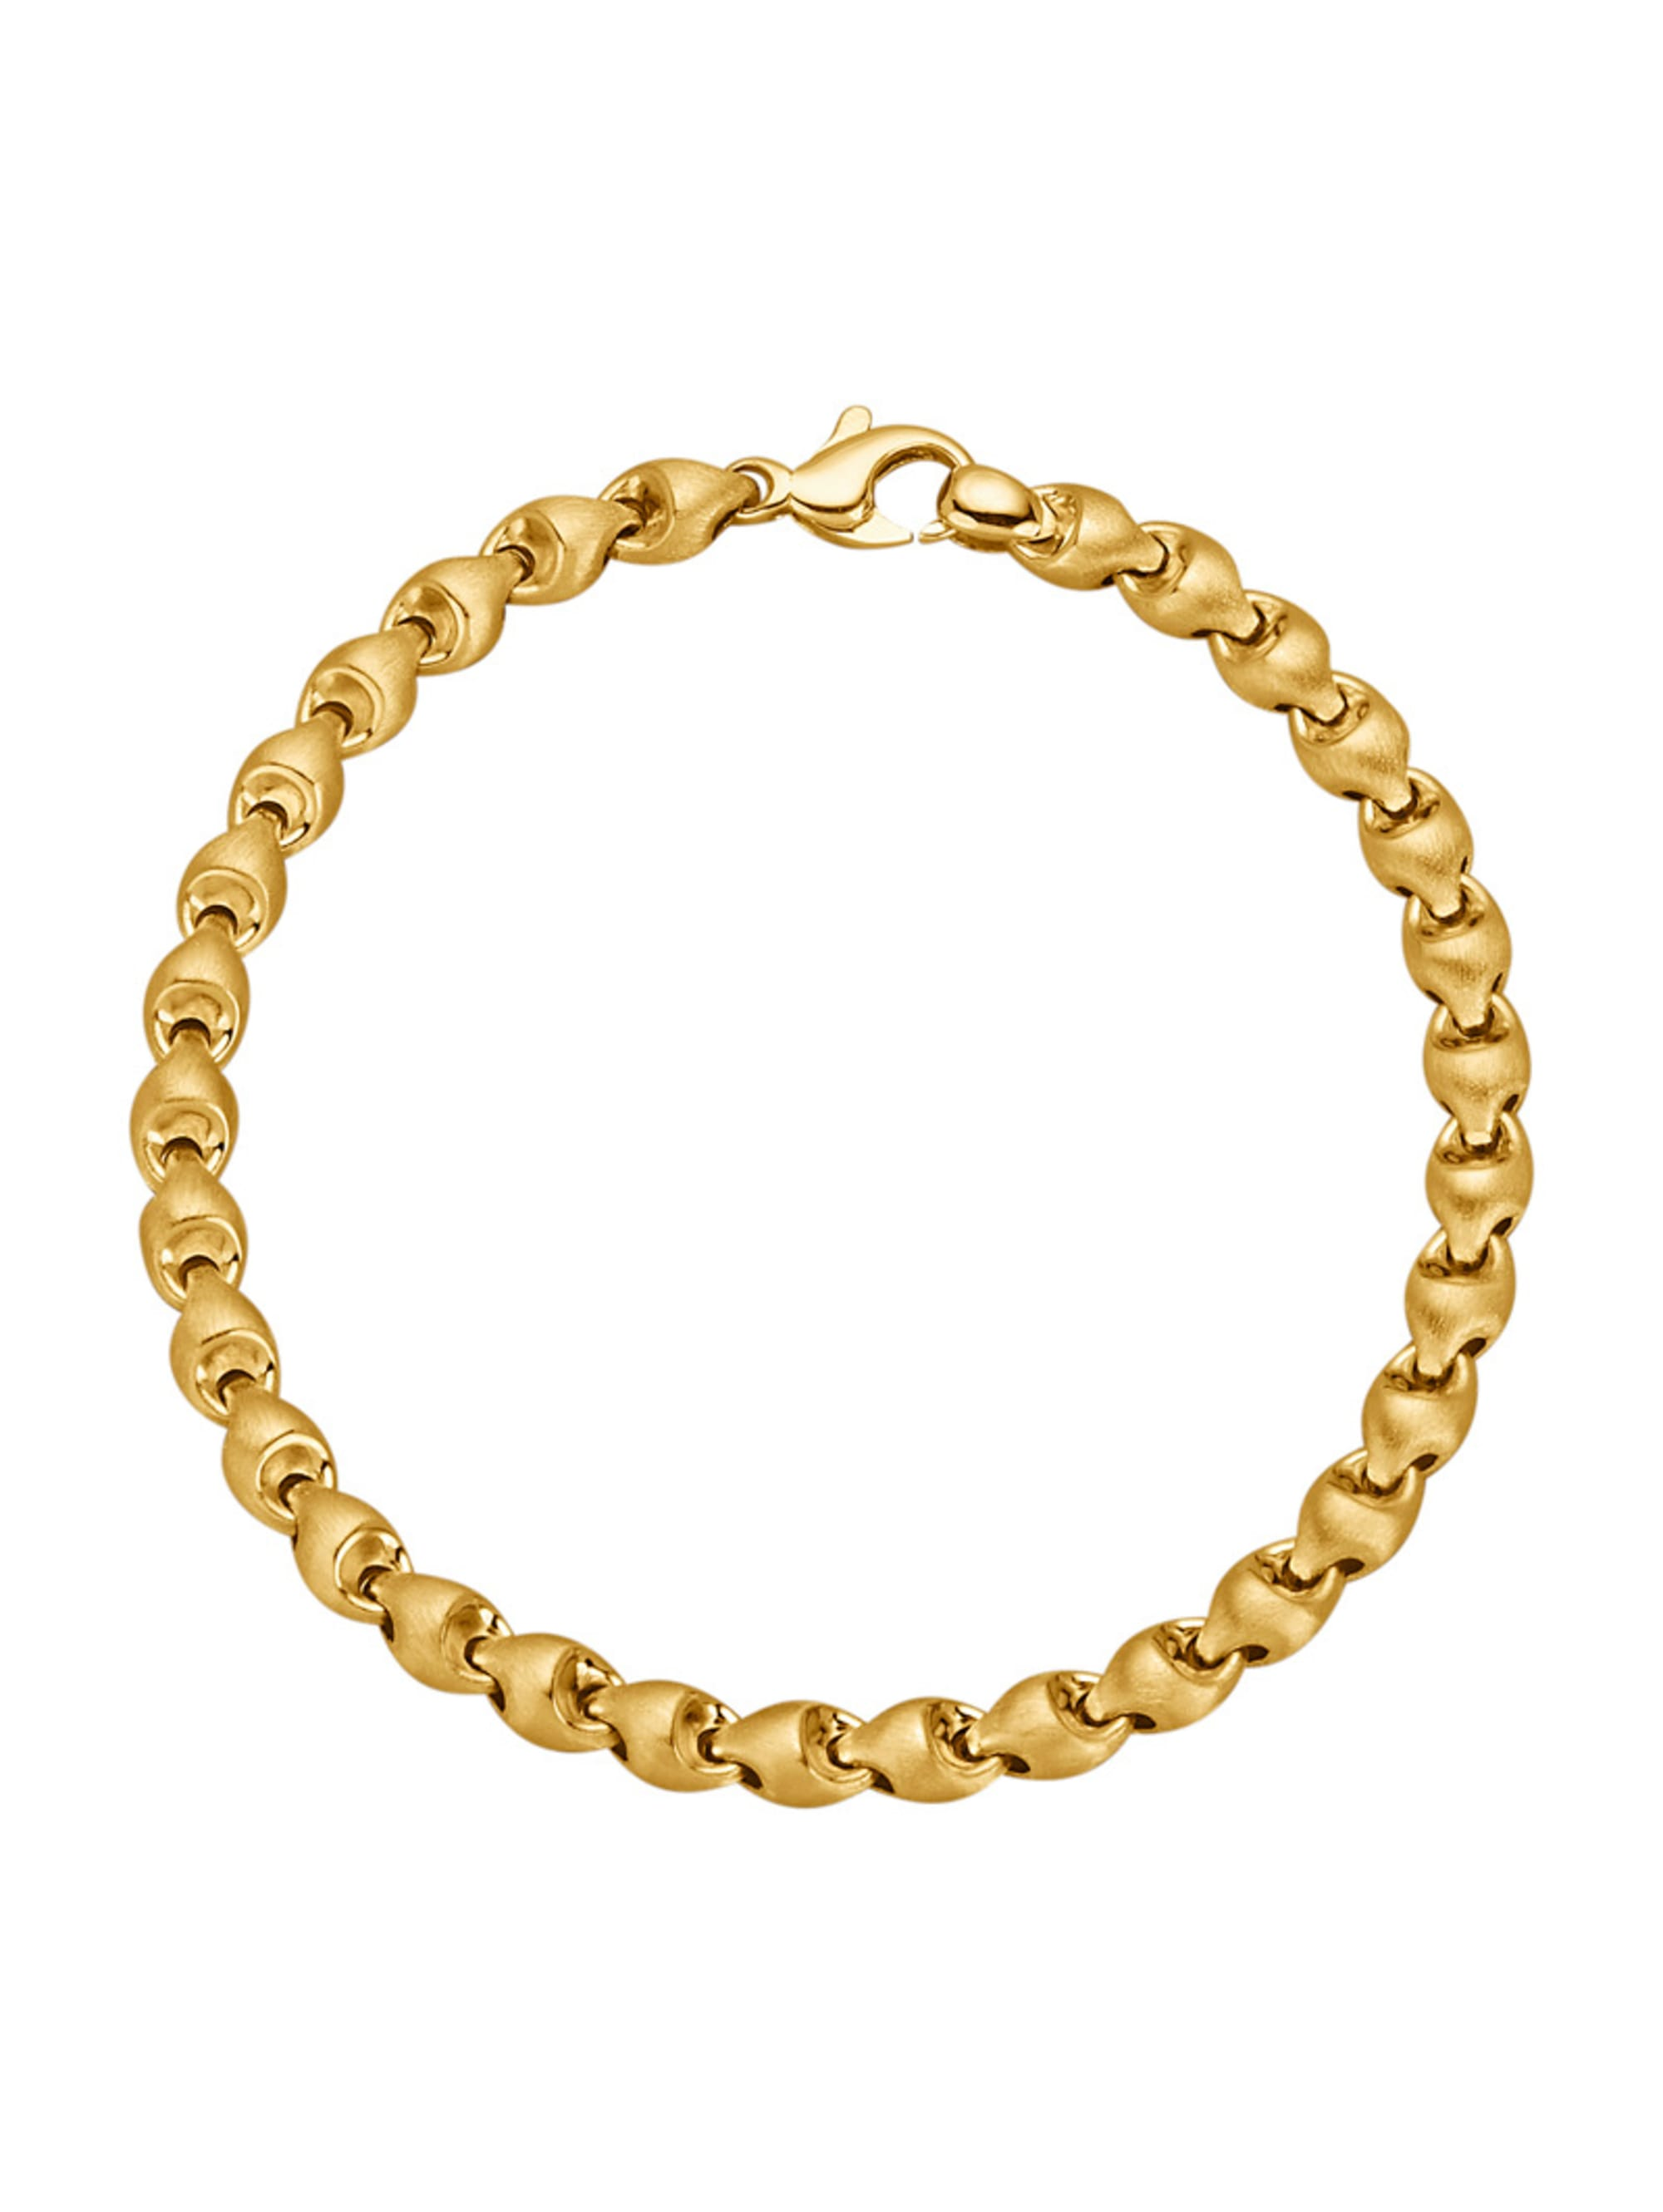 Armband in Gelbgold 585 lytiM